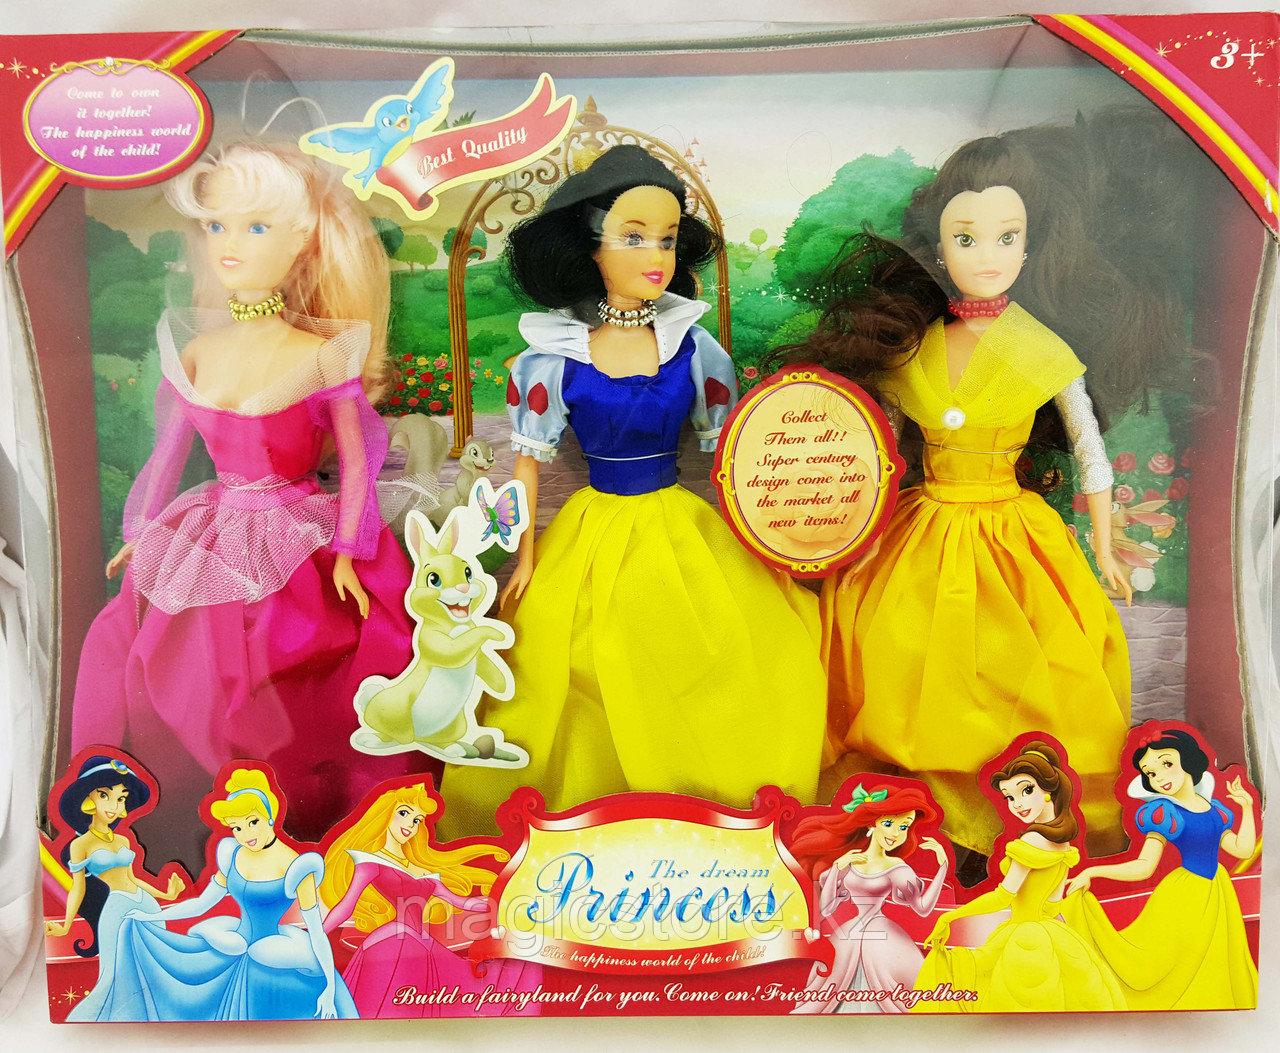 Кукла Disney The Dream Princess (набор из 3-ёх кукол) - фото 1